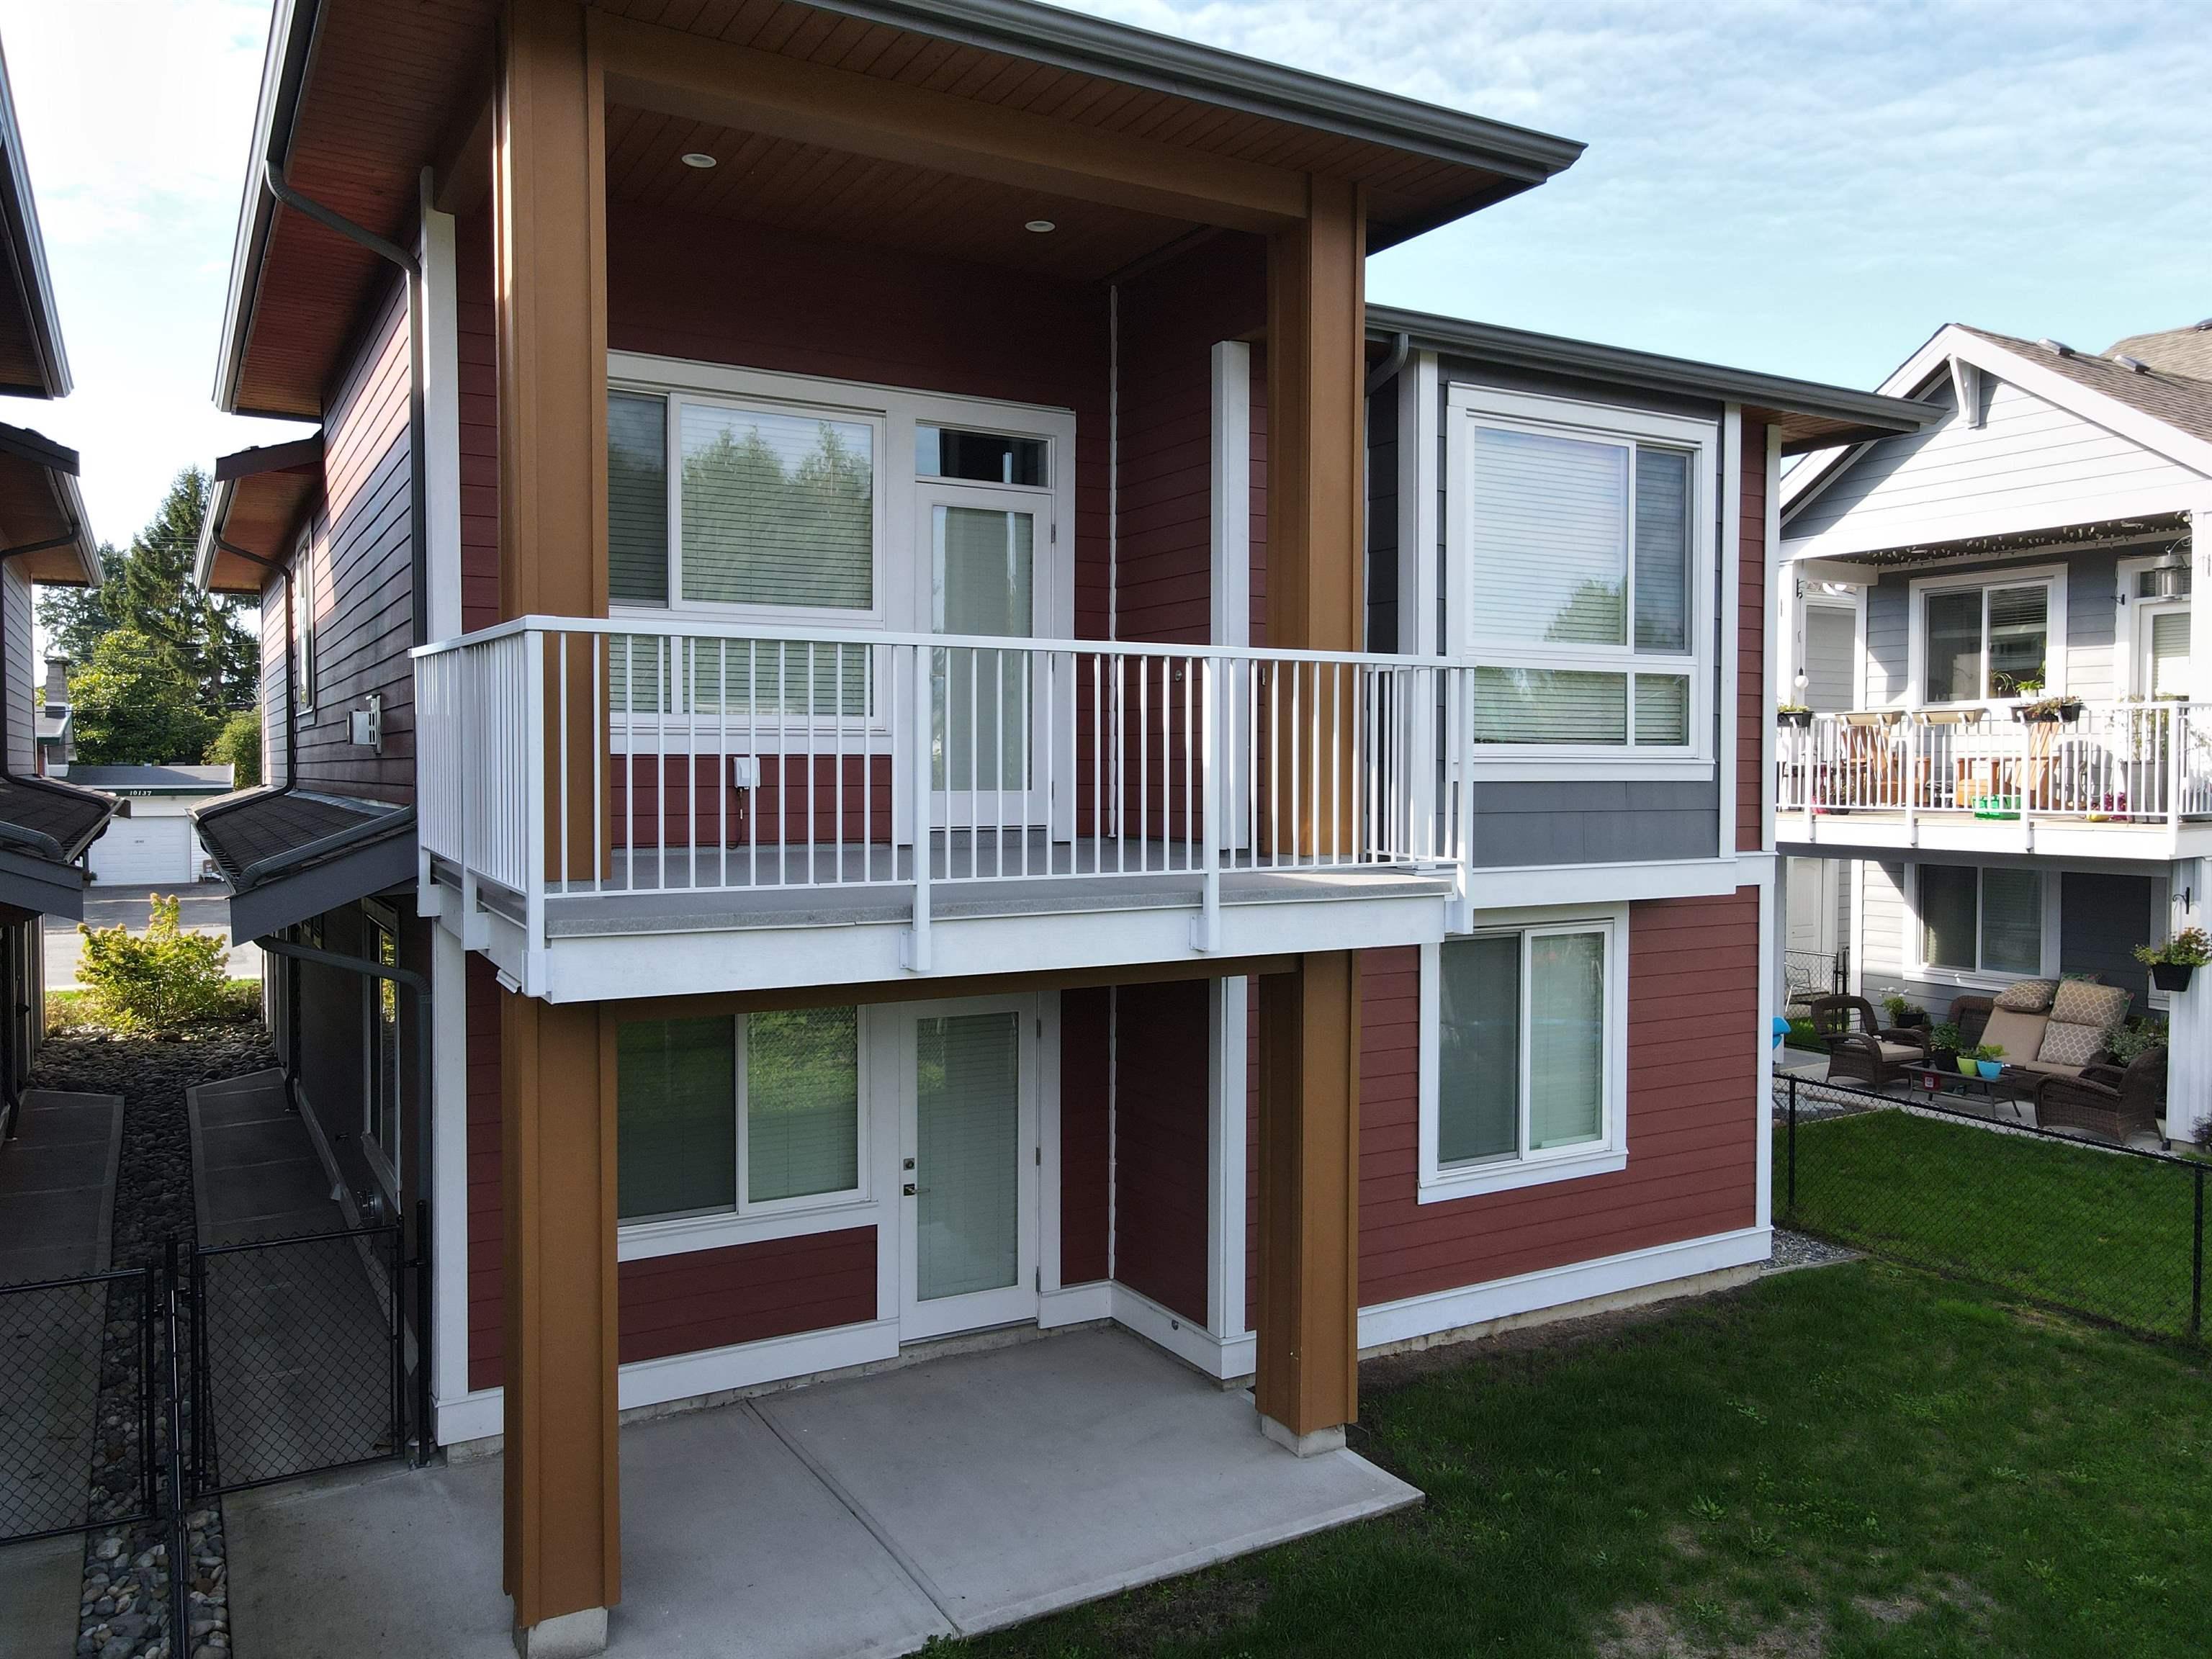 10144 KILLARNEY DRIVE - Fairfield Island House/Single Family for sale, 5 Bedrooms (R2625716) - #6